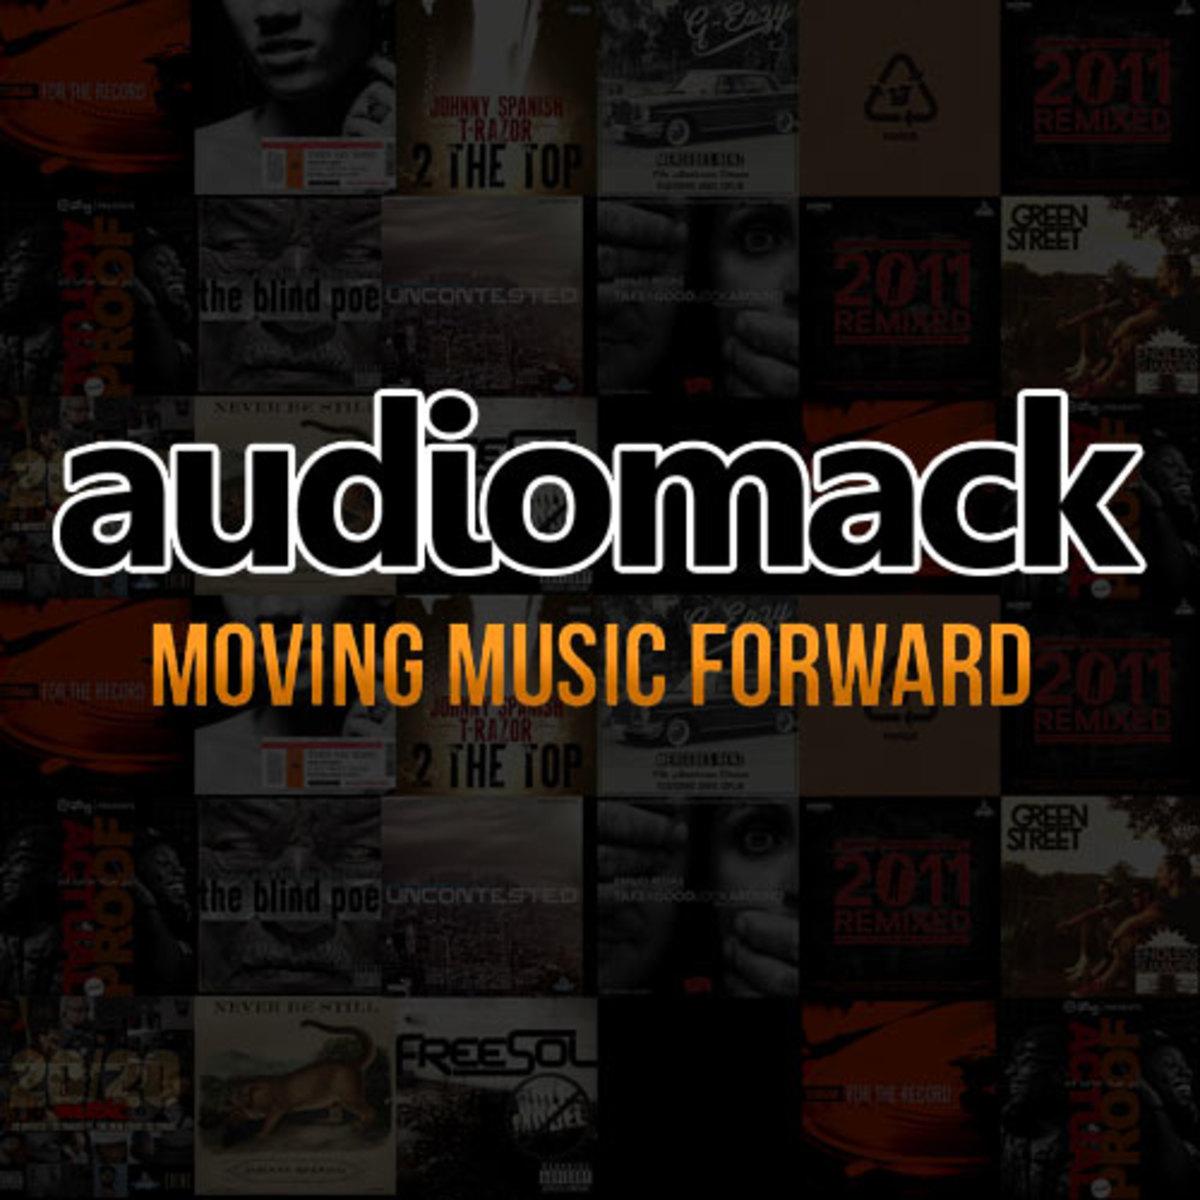 audiomack-500px.jpg